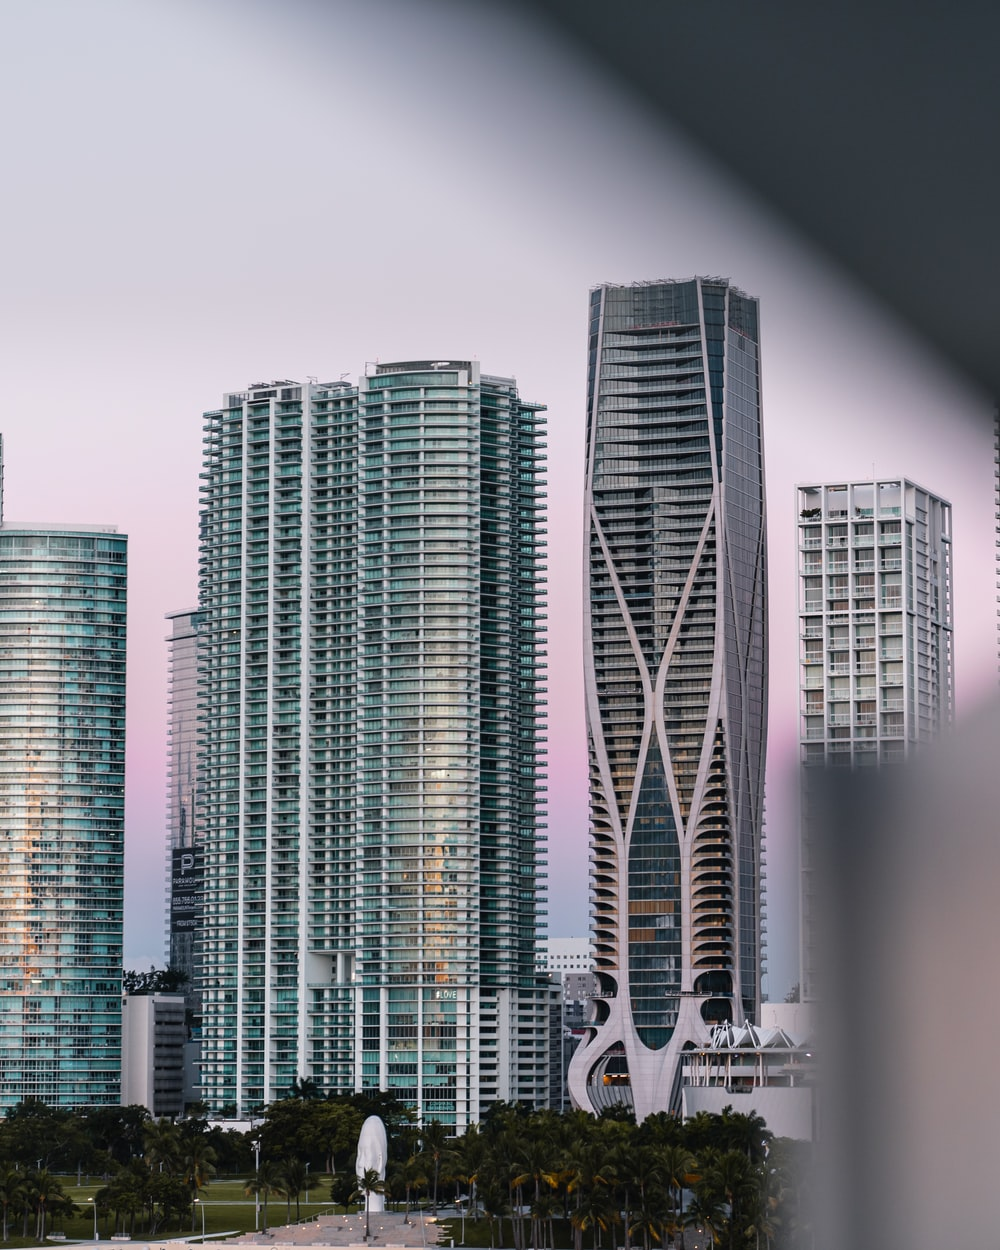 high rise buildings near trees